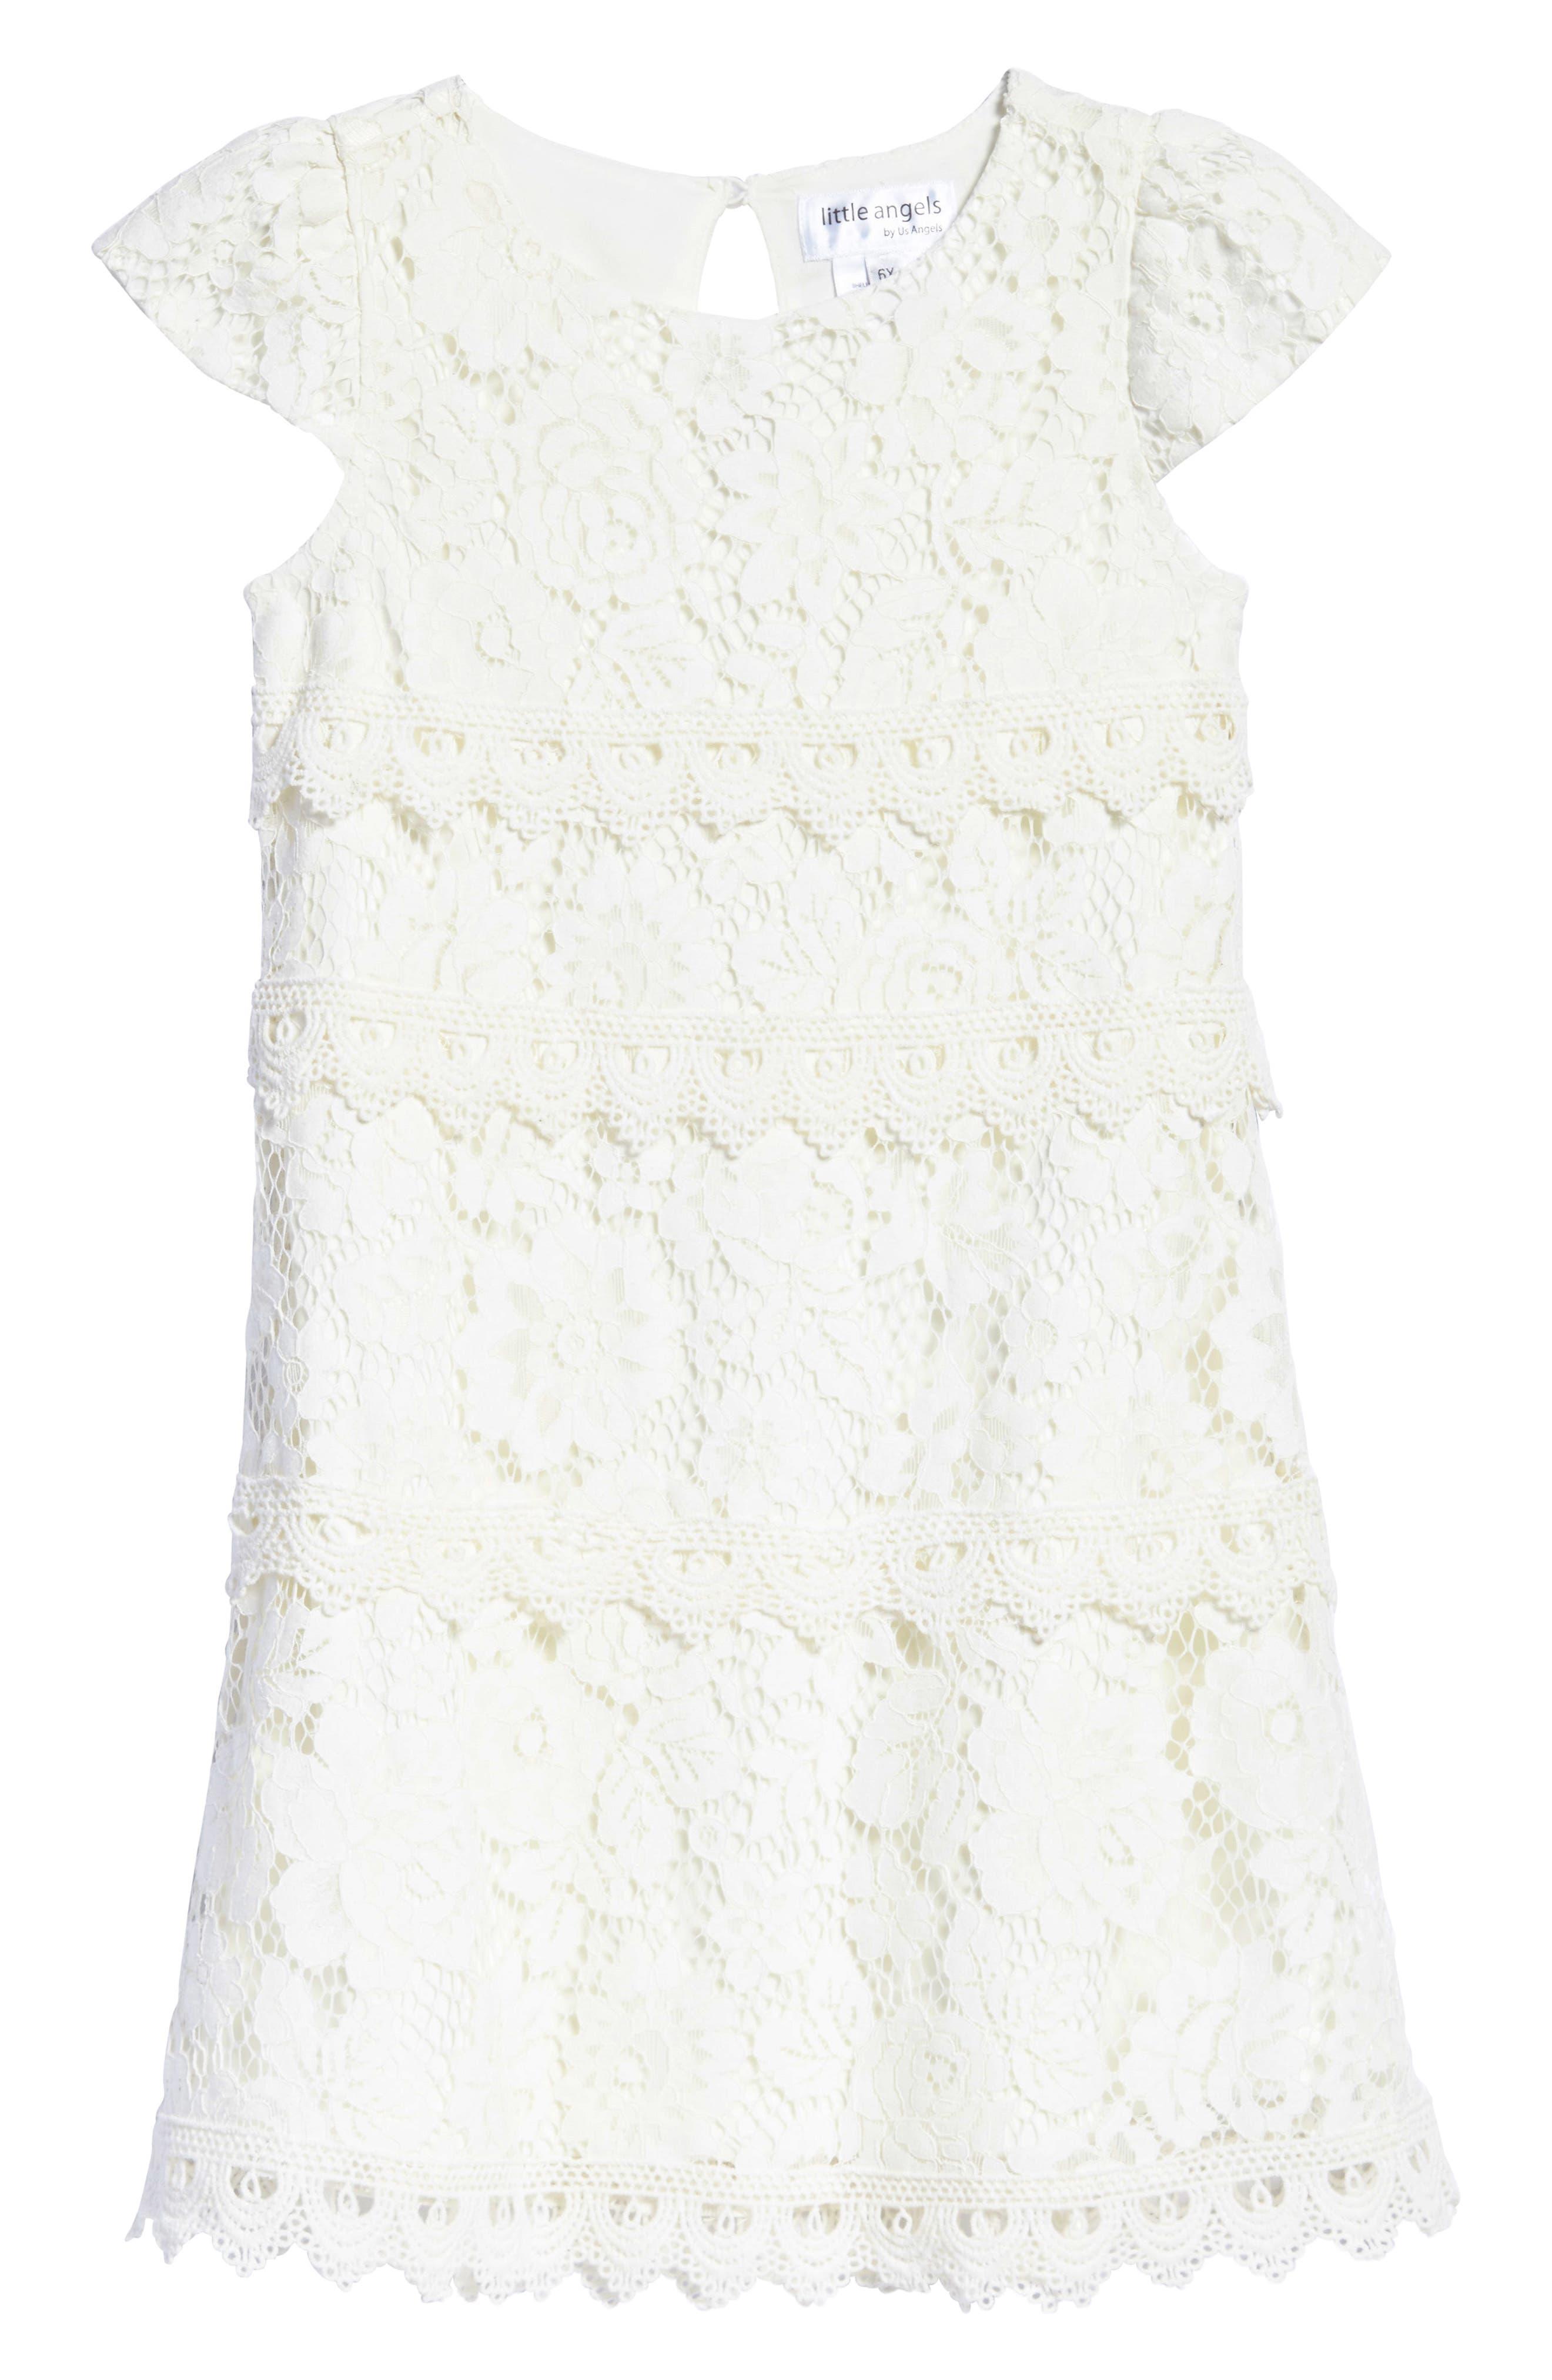 Lace Shift Dress,                             Main thumbnail 1, color,                             902